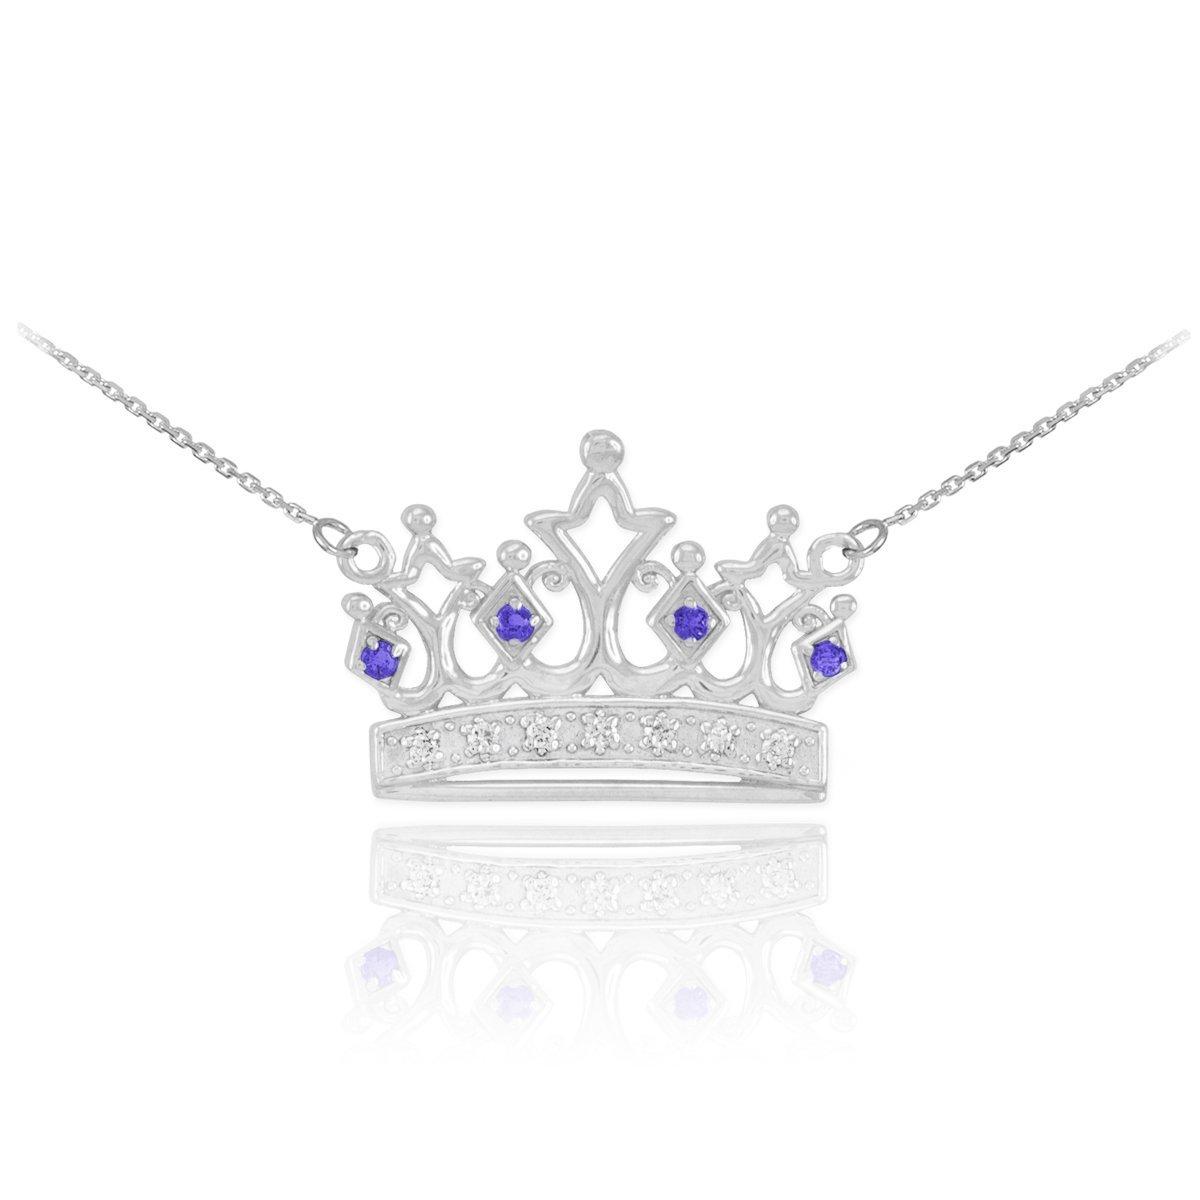 Dainty 14k White Gold Blue Sapphire and Diamond Tiara Charm Crown Pendant Necklace